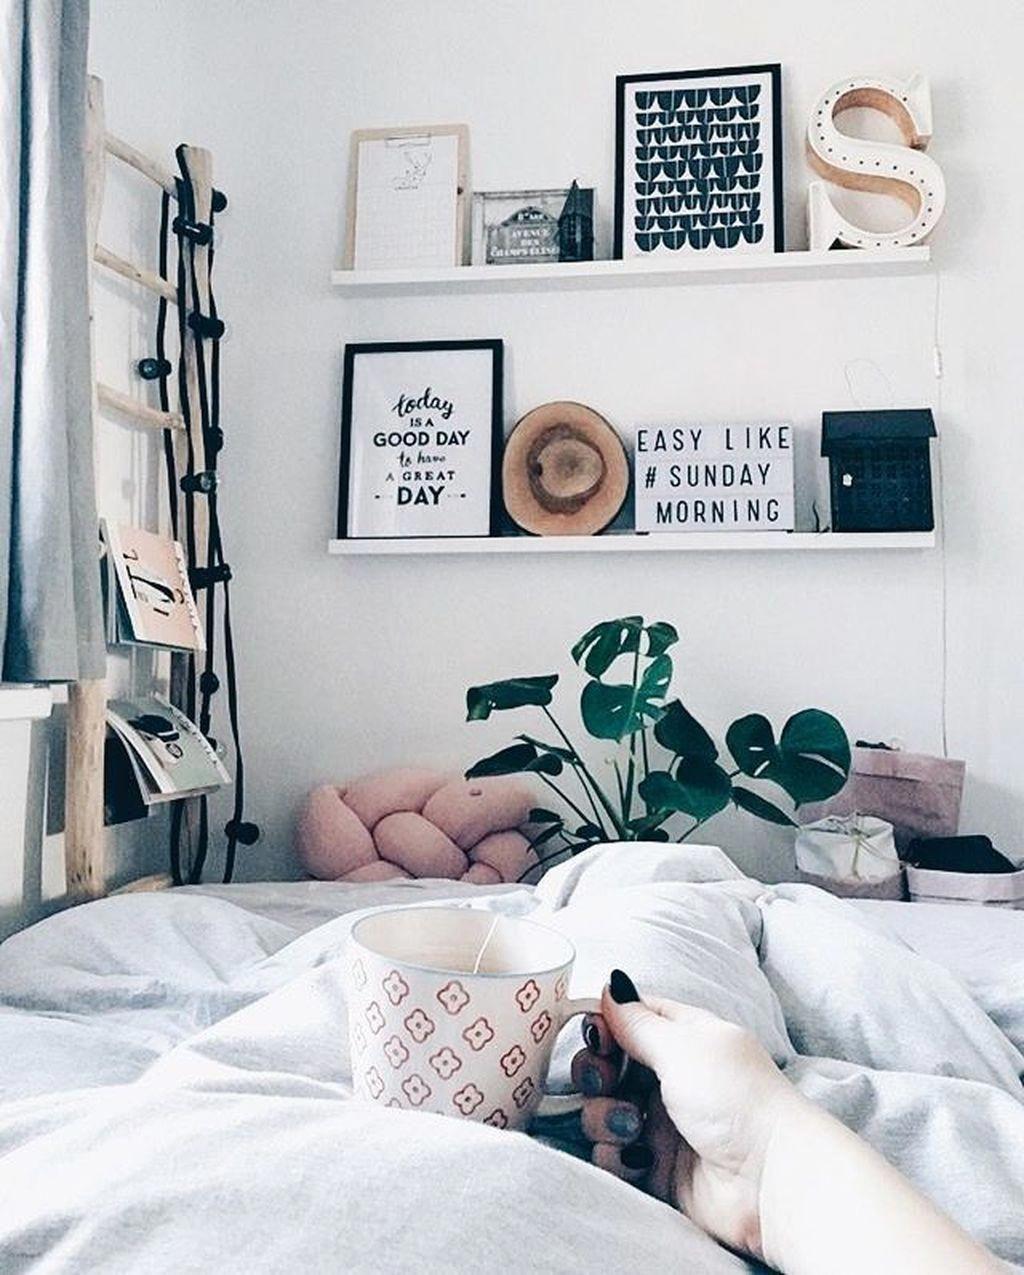 20 Genius Bedroom Organization Ideas For Inspiration Trenduhome Bedroom Decor Inspiration Organization Bedroom Home Decor Bedroom Easy bedroom organization ideas